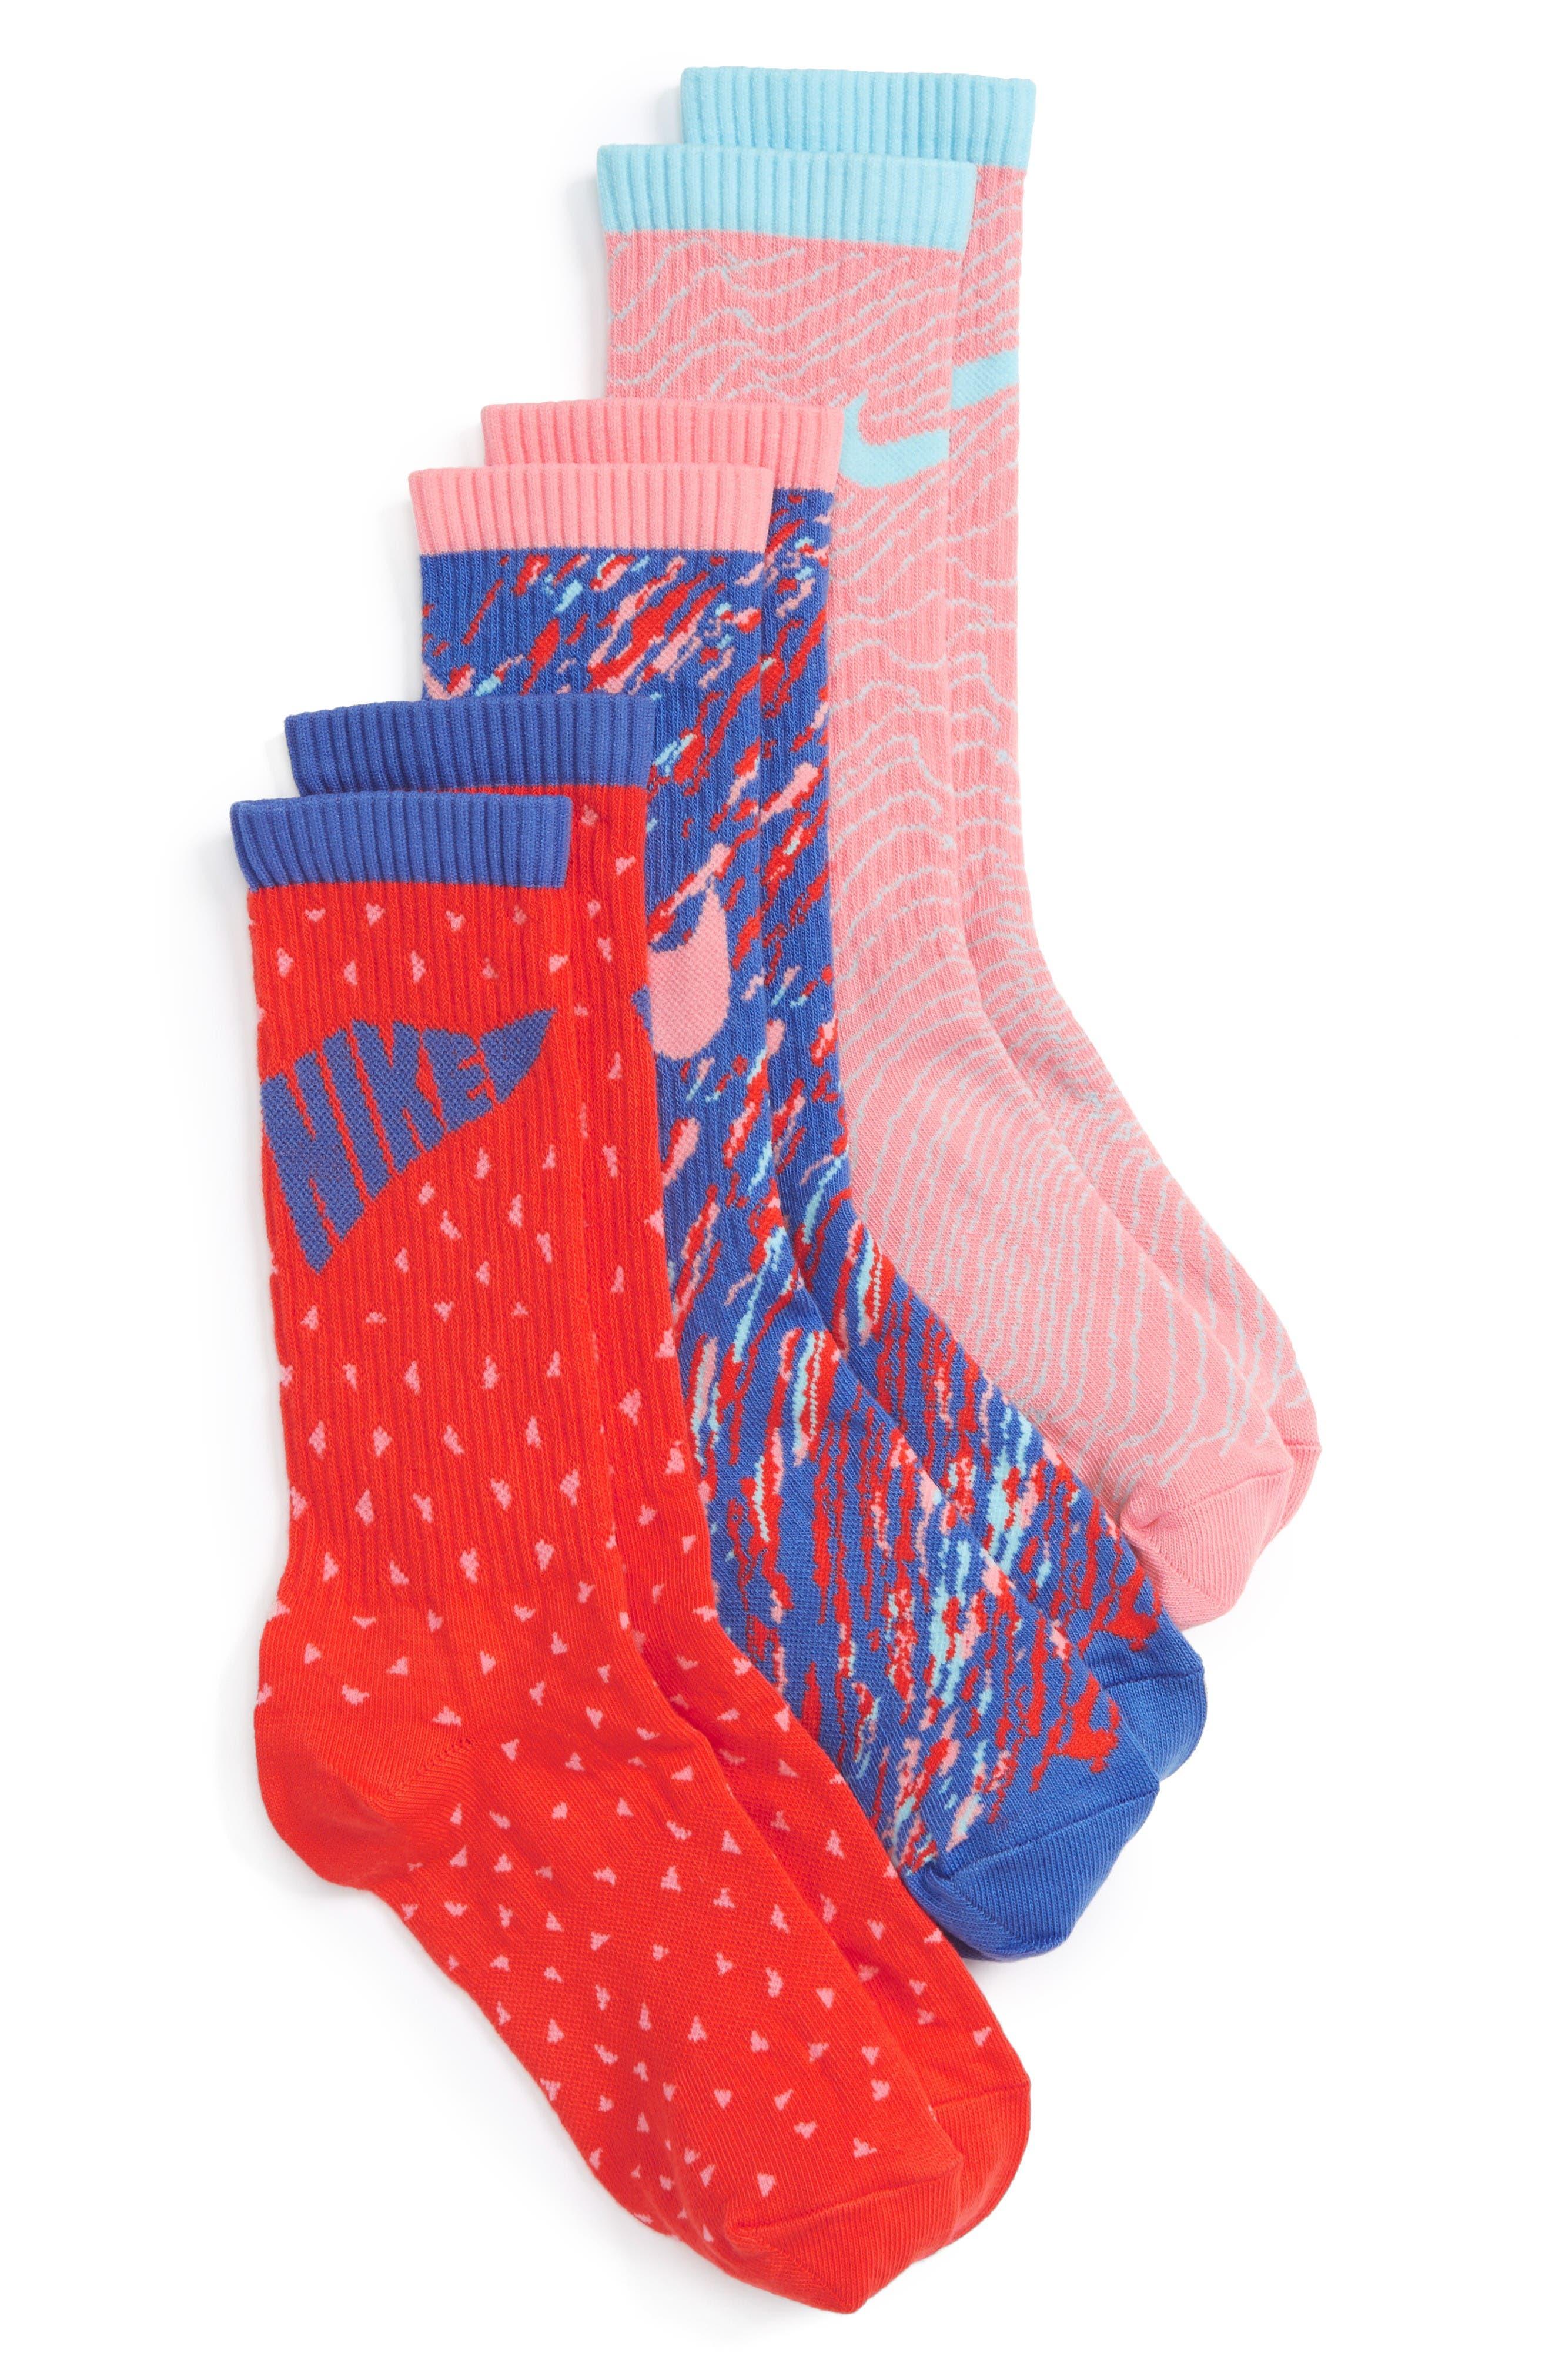 Main Image - Nike 3-Pack Graphic Crew Socks (Walker, Toddler, Little Kid & Big Kid)